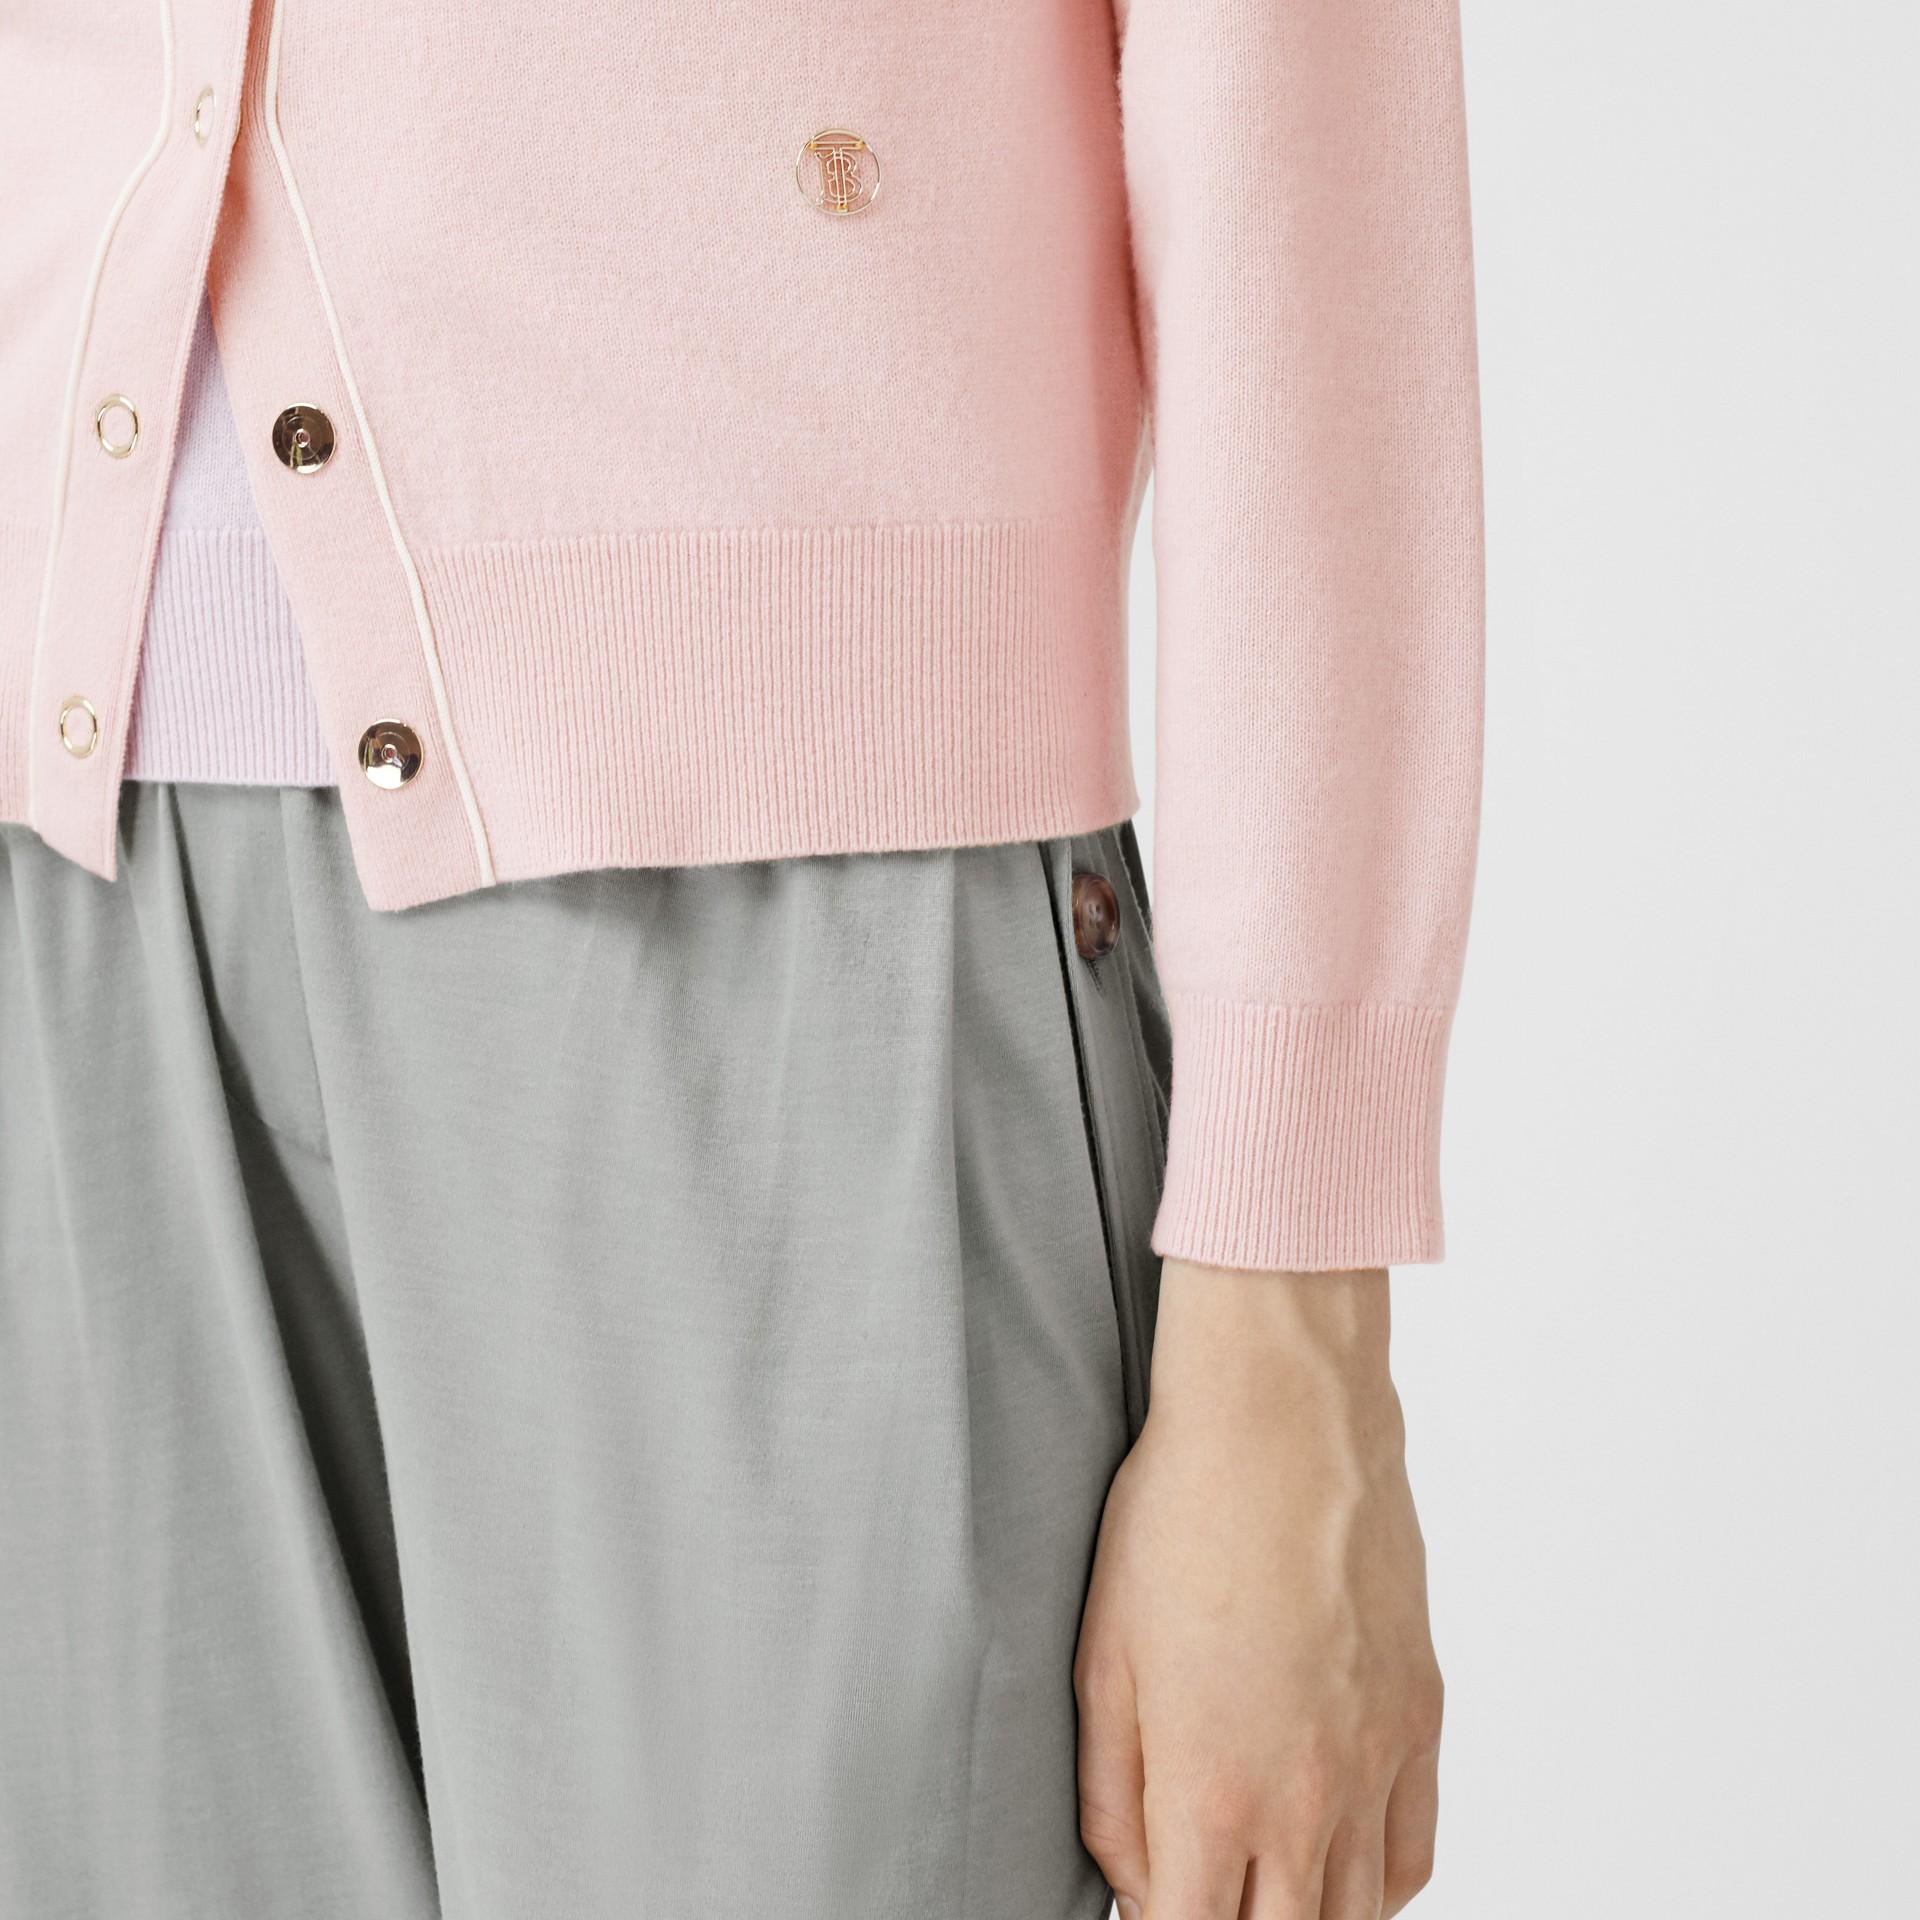 Silk Trim Monogram Motif Cashmere Cardigan in Copper Pink - Women | Burberry United Kingdom - gallery image 4